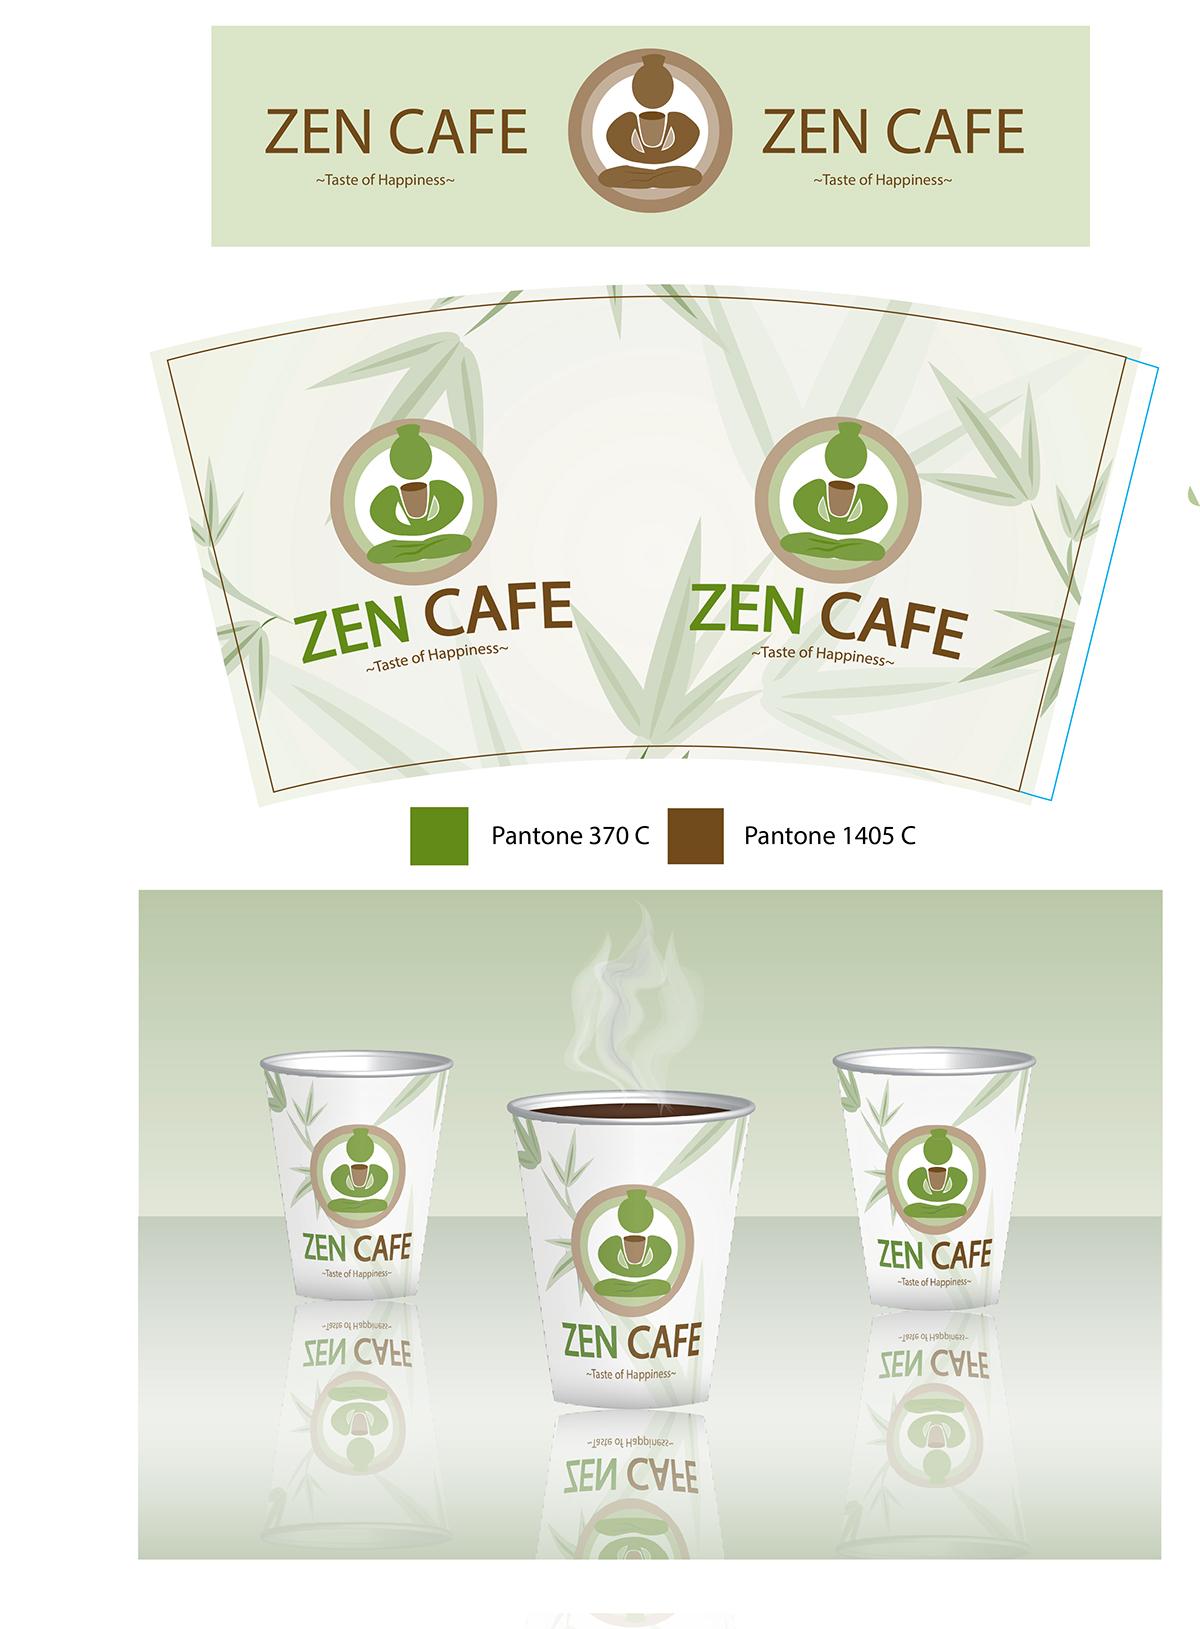 Zen poster design - Zen Cafe Poster Design